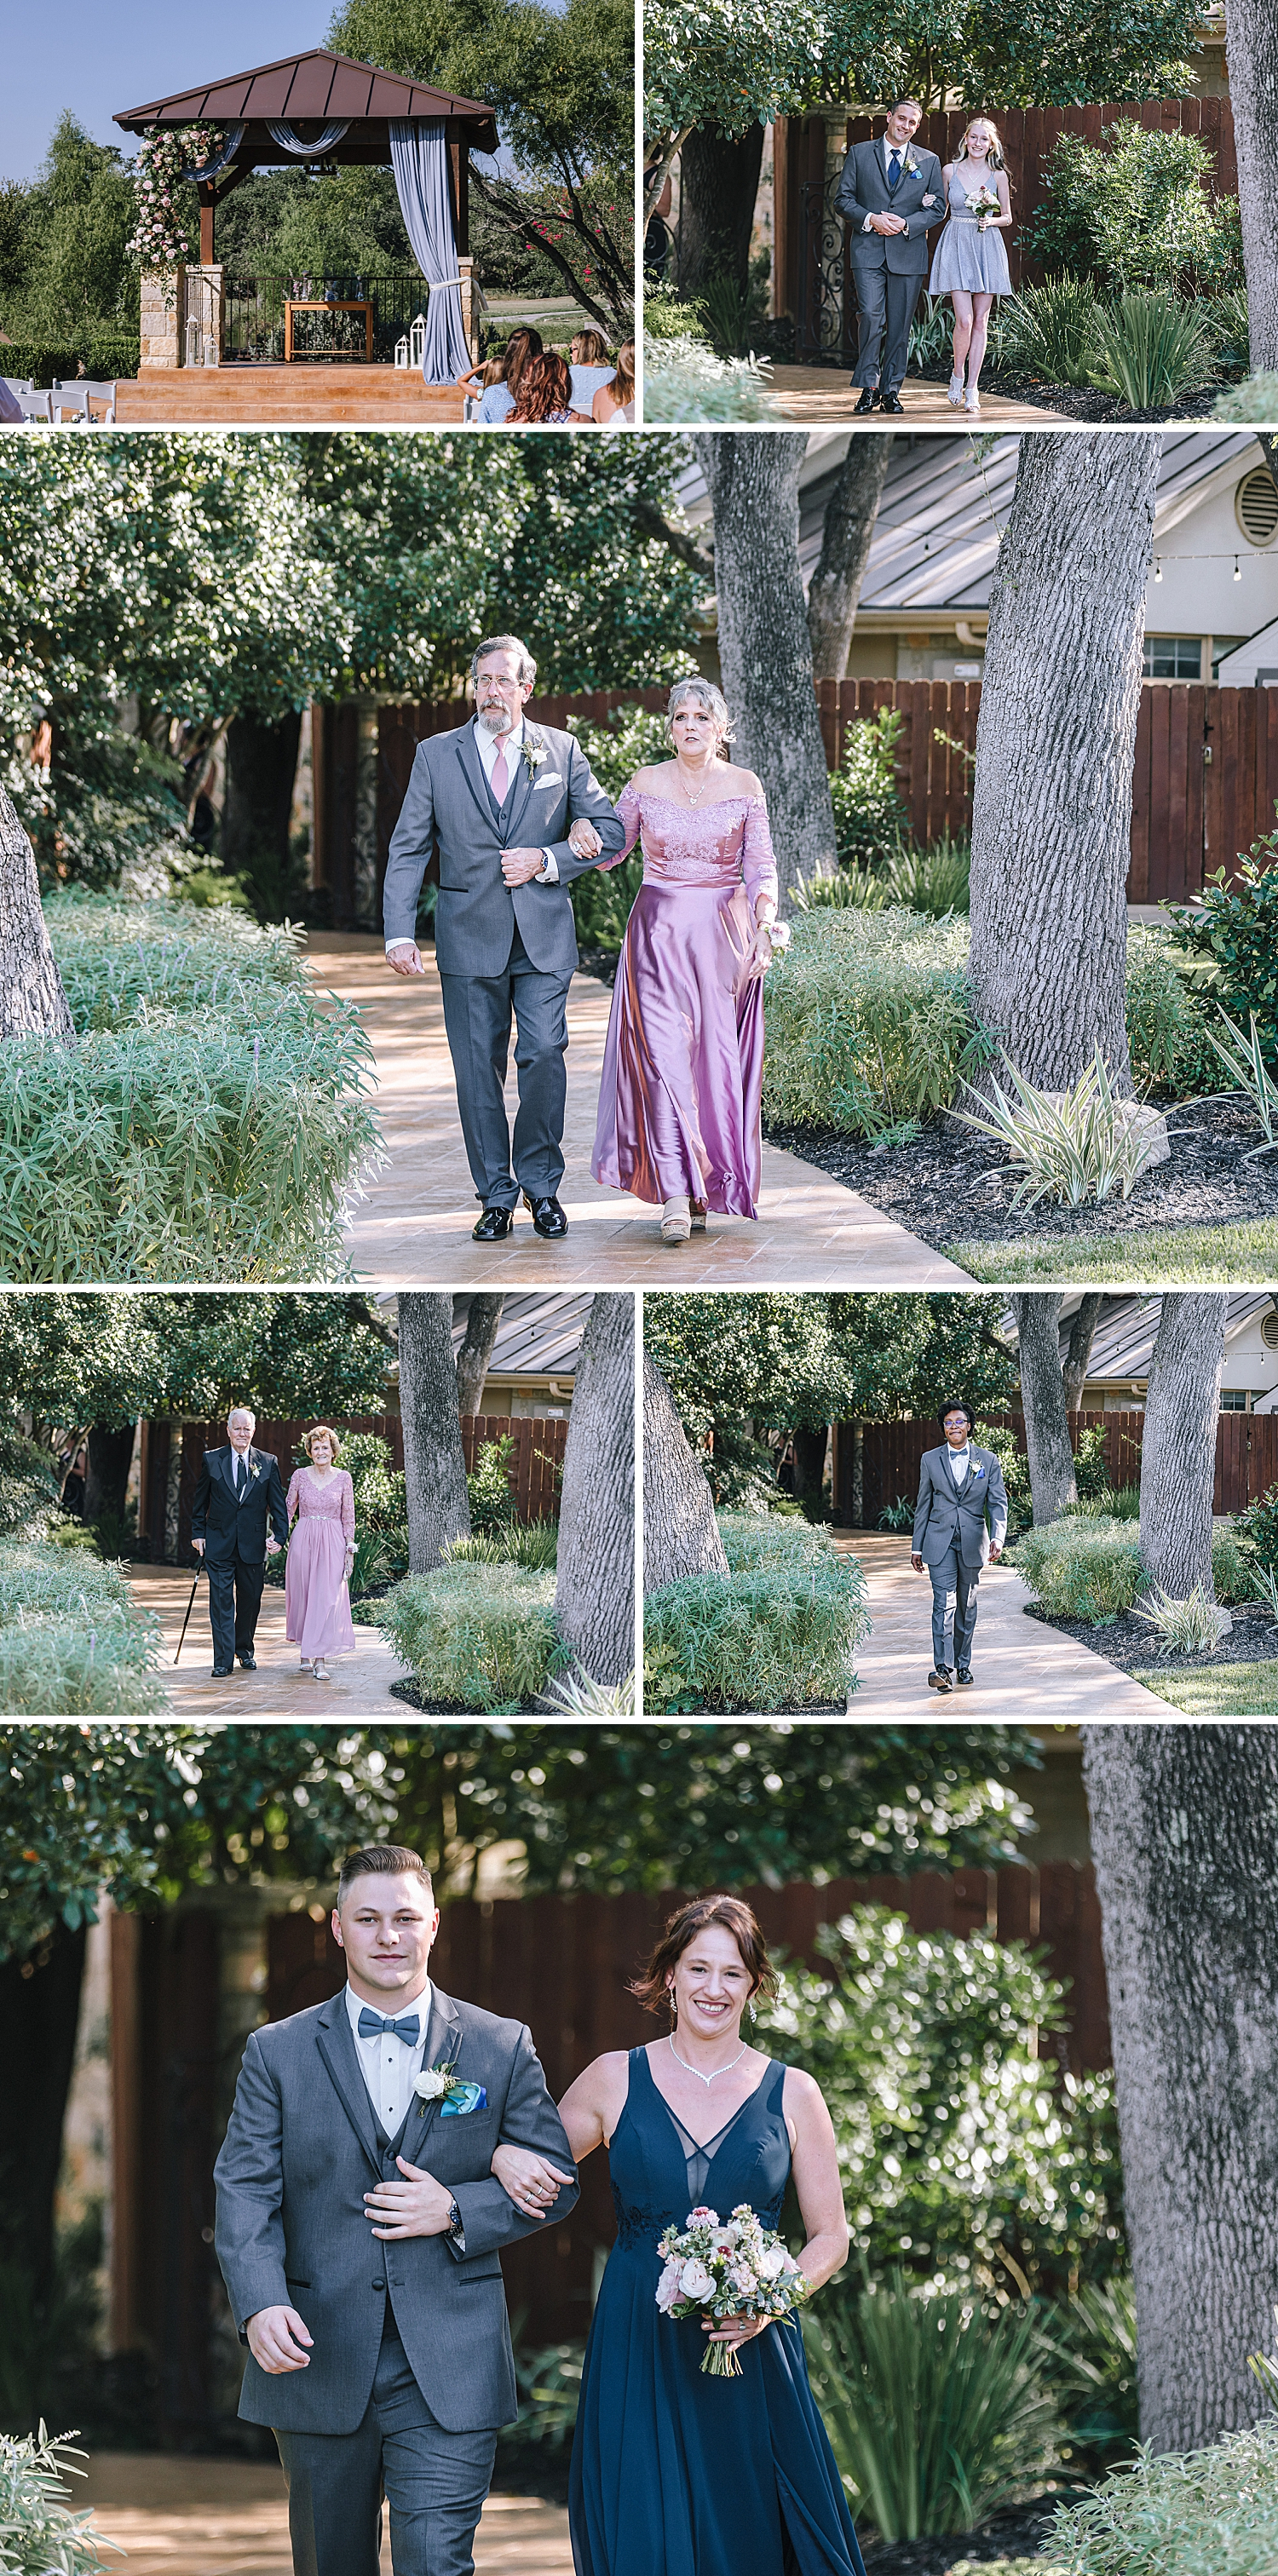 The-Club-at-Garden-Ridge-Military-Wedding-Carly-Barton-Photography_0061.jpg